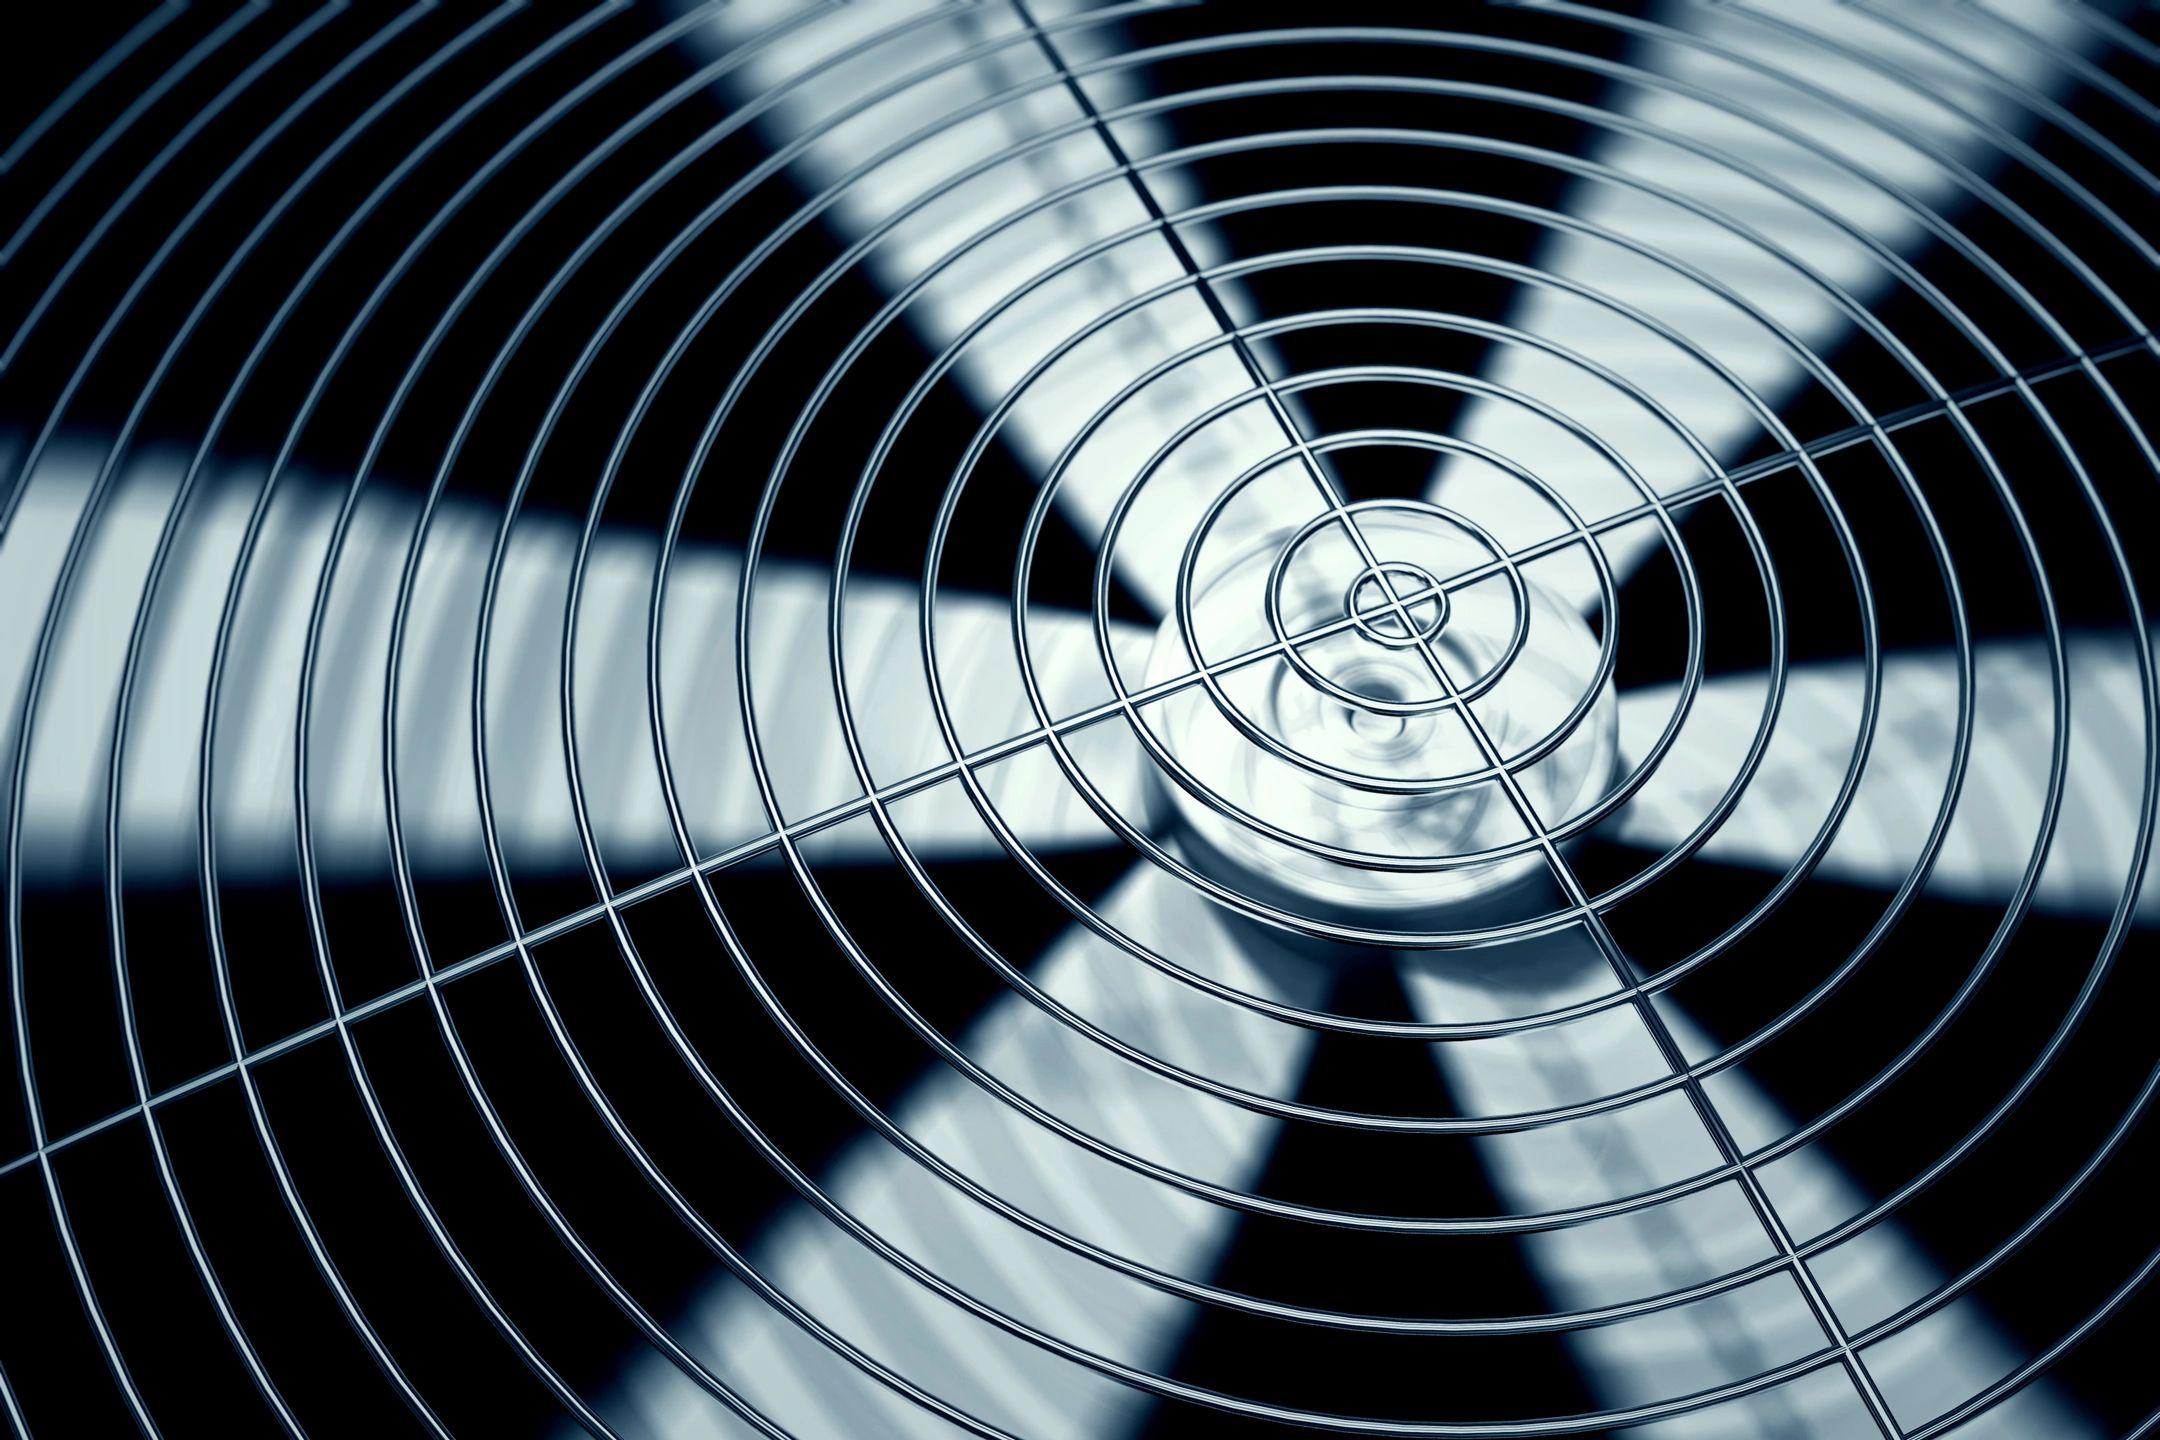 a fan that needs emergency air conditioner repair in metro east illinois, emergency AC repair